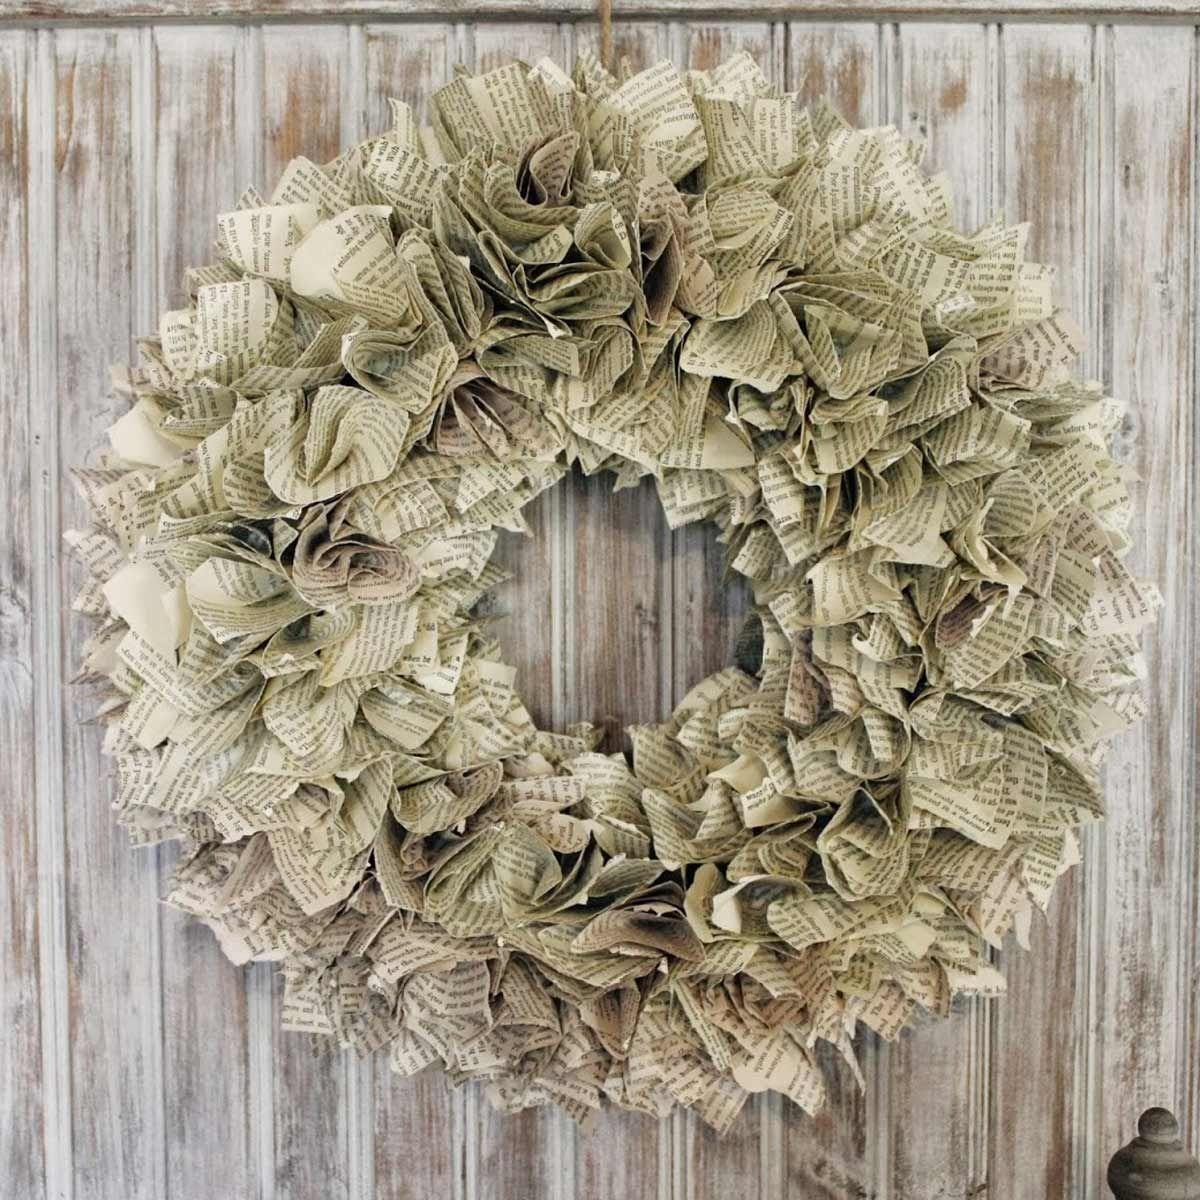 Wreath repurposed from old books.jpg